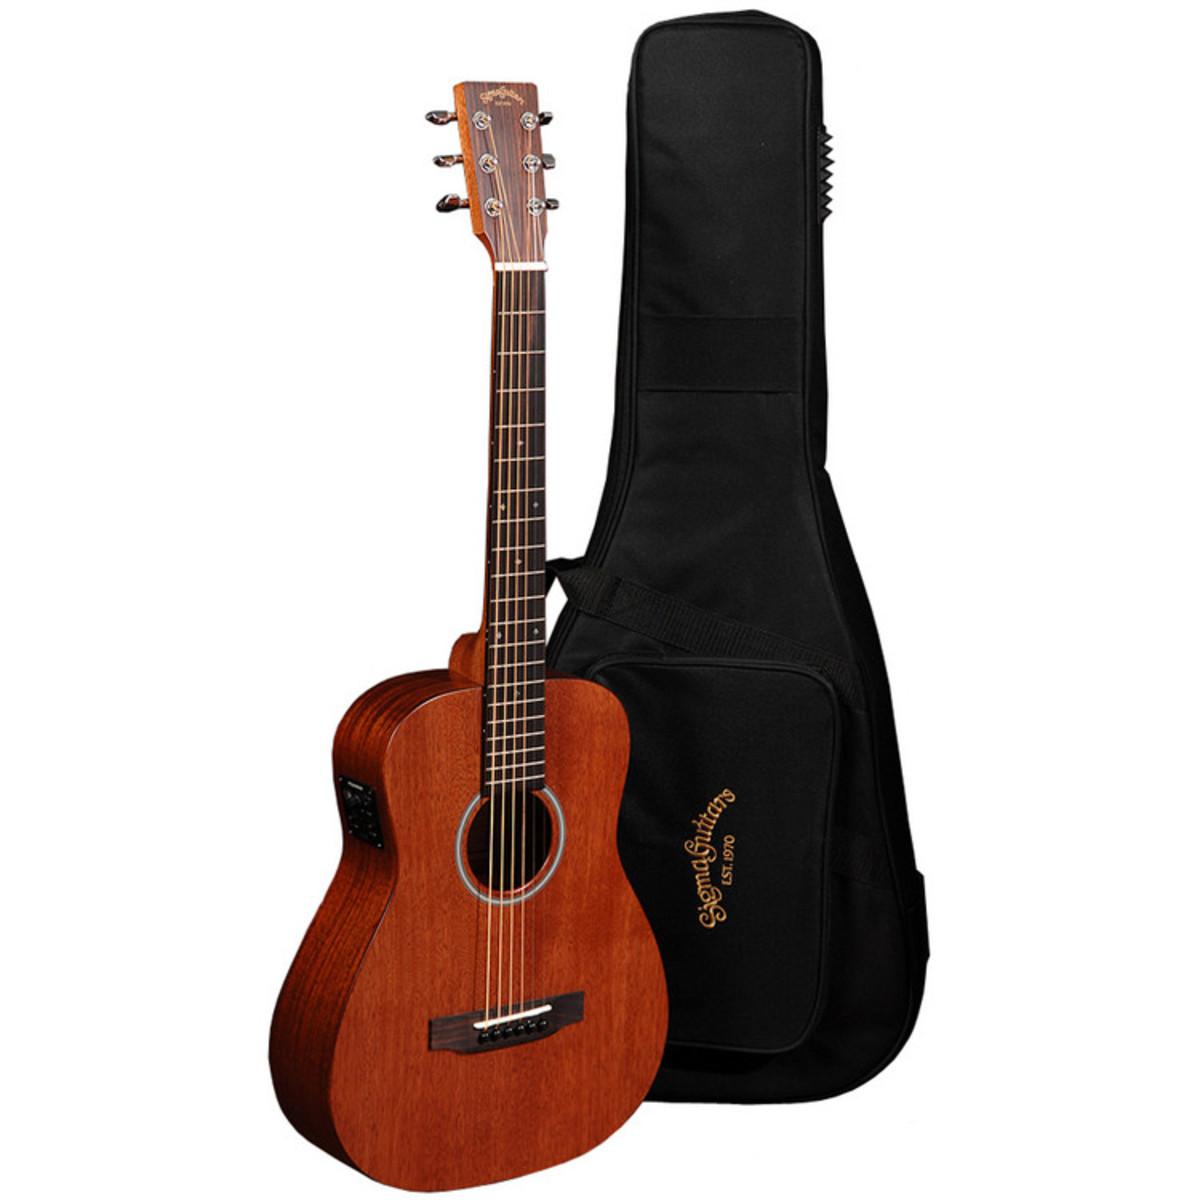 sigma tm 15e electro acoustic travel guitar mahogany at. Black Bedroom Furniture Sets. Home Design Ideas